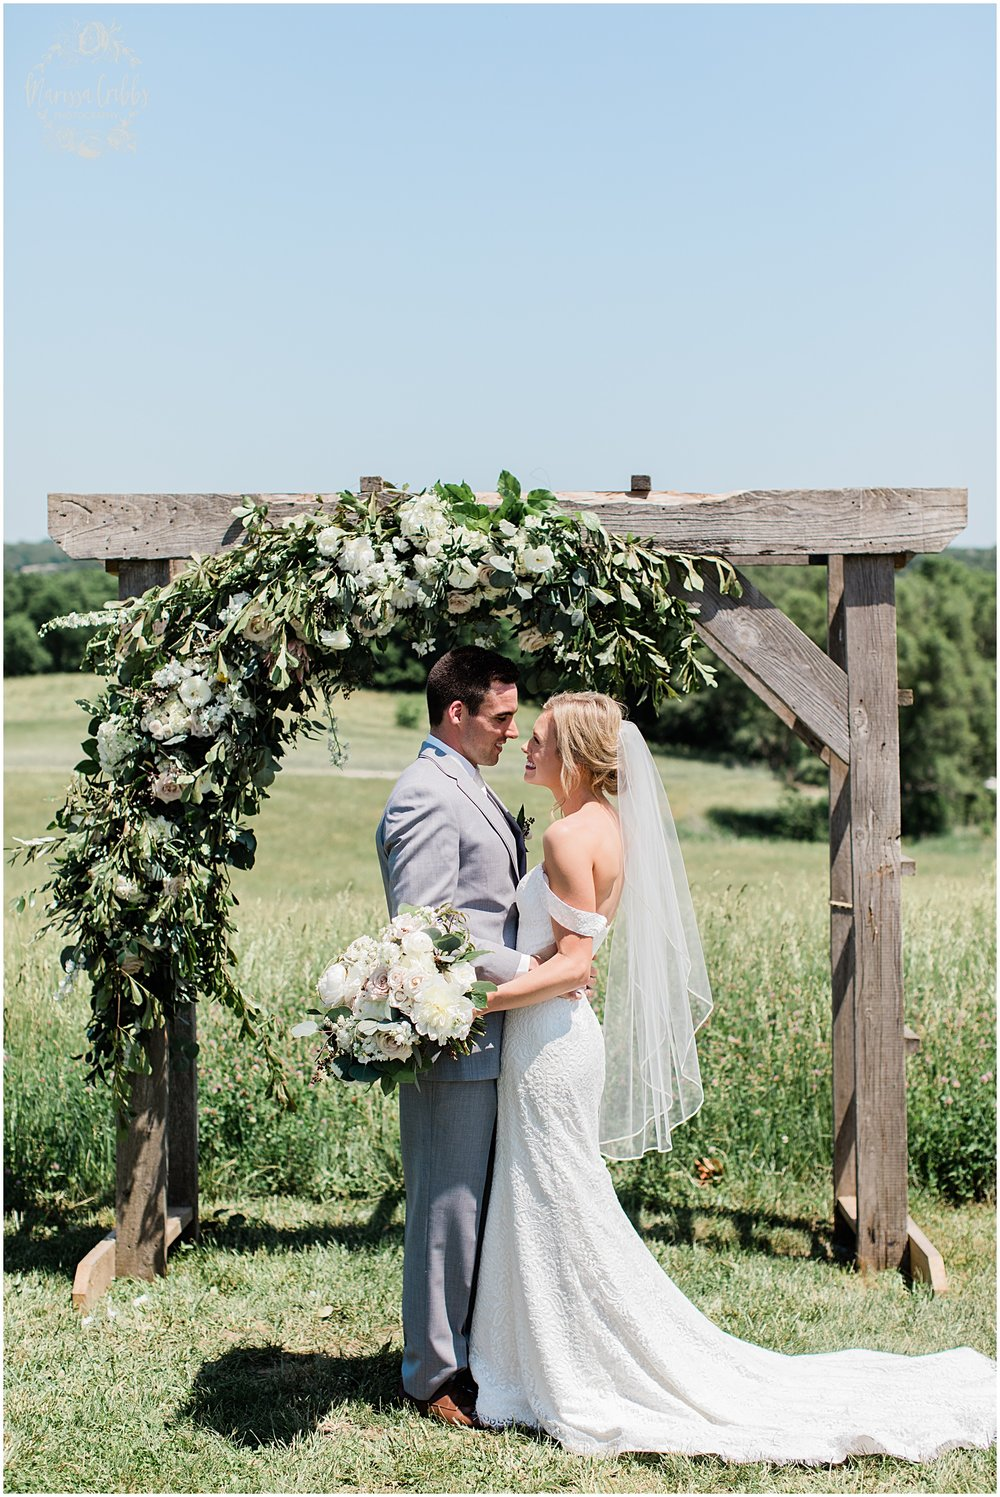 RHODES WEDDING | WESTON RED BARN FARM | MARISSA CRIBBS PHOTOGRAPHY_5227.jpg